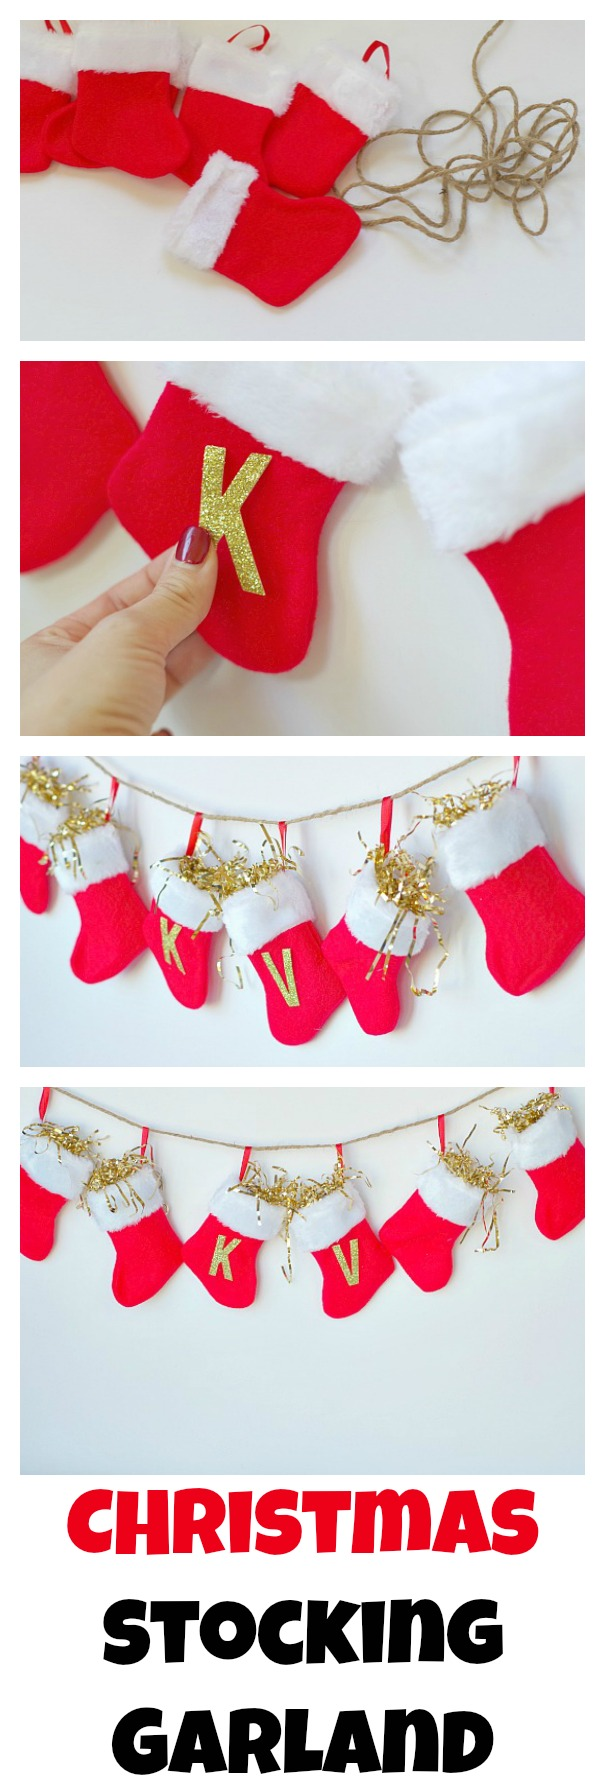 Christmas stocking garland val event gal